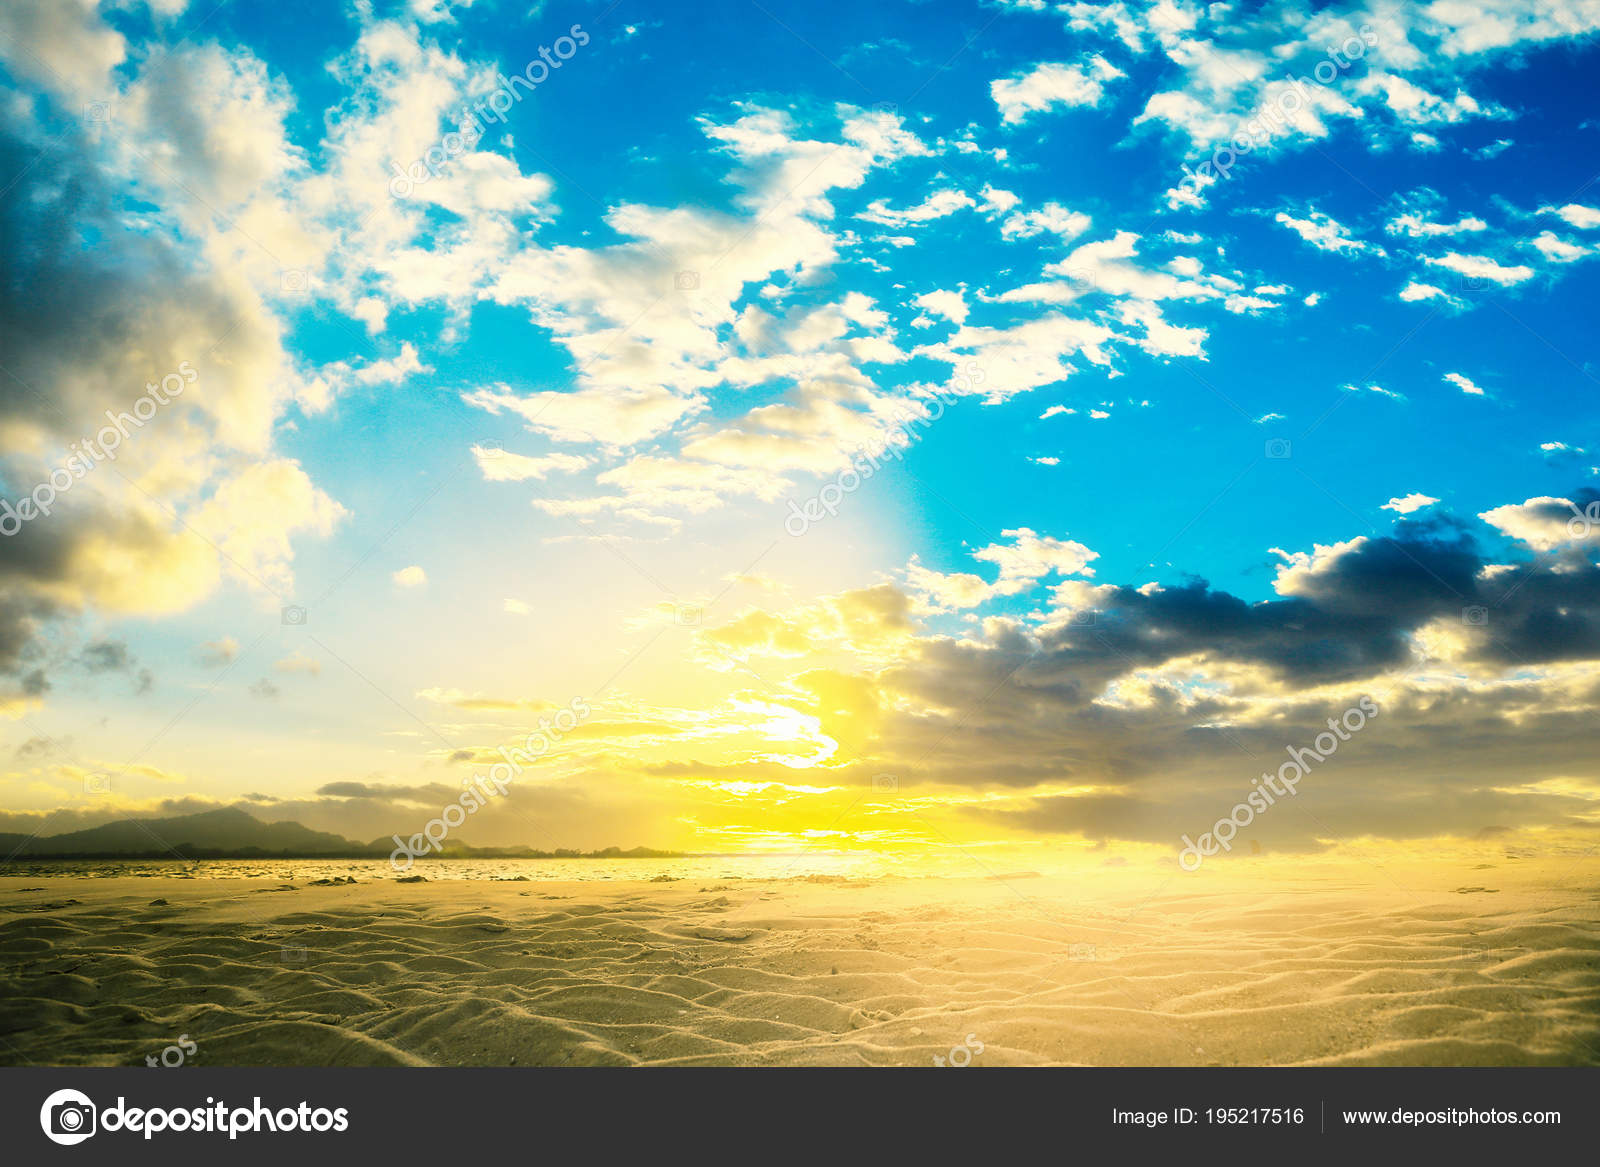 Windy Wallpaper Summer Sunset Cloudy Background Puffy